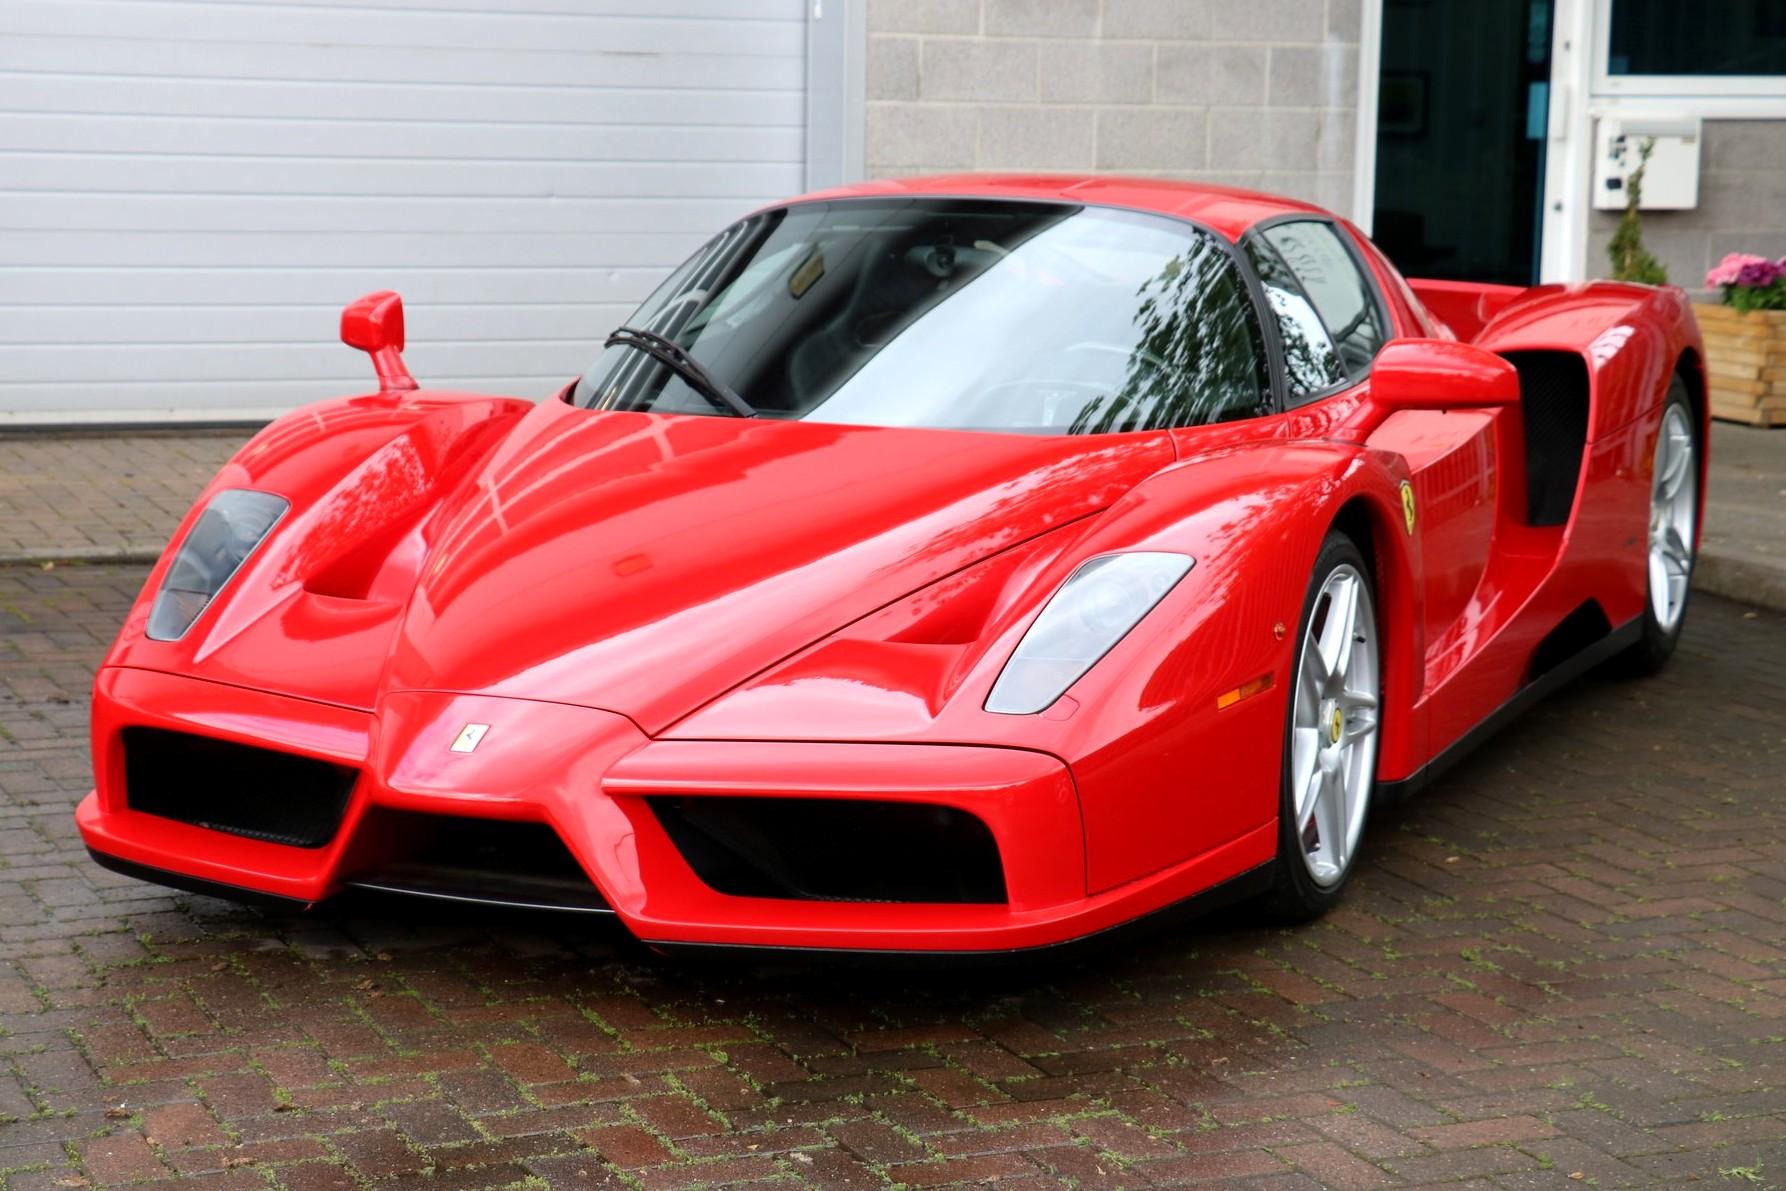 Best exotic cars of all times: 2004 Ferrari Enzo, Kenton, UK, approx. $2,132,610.